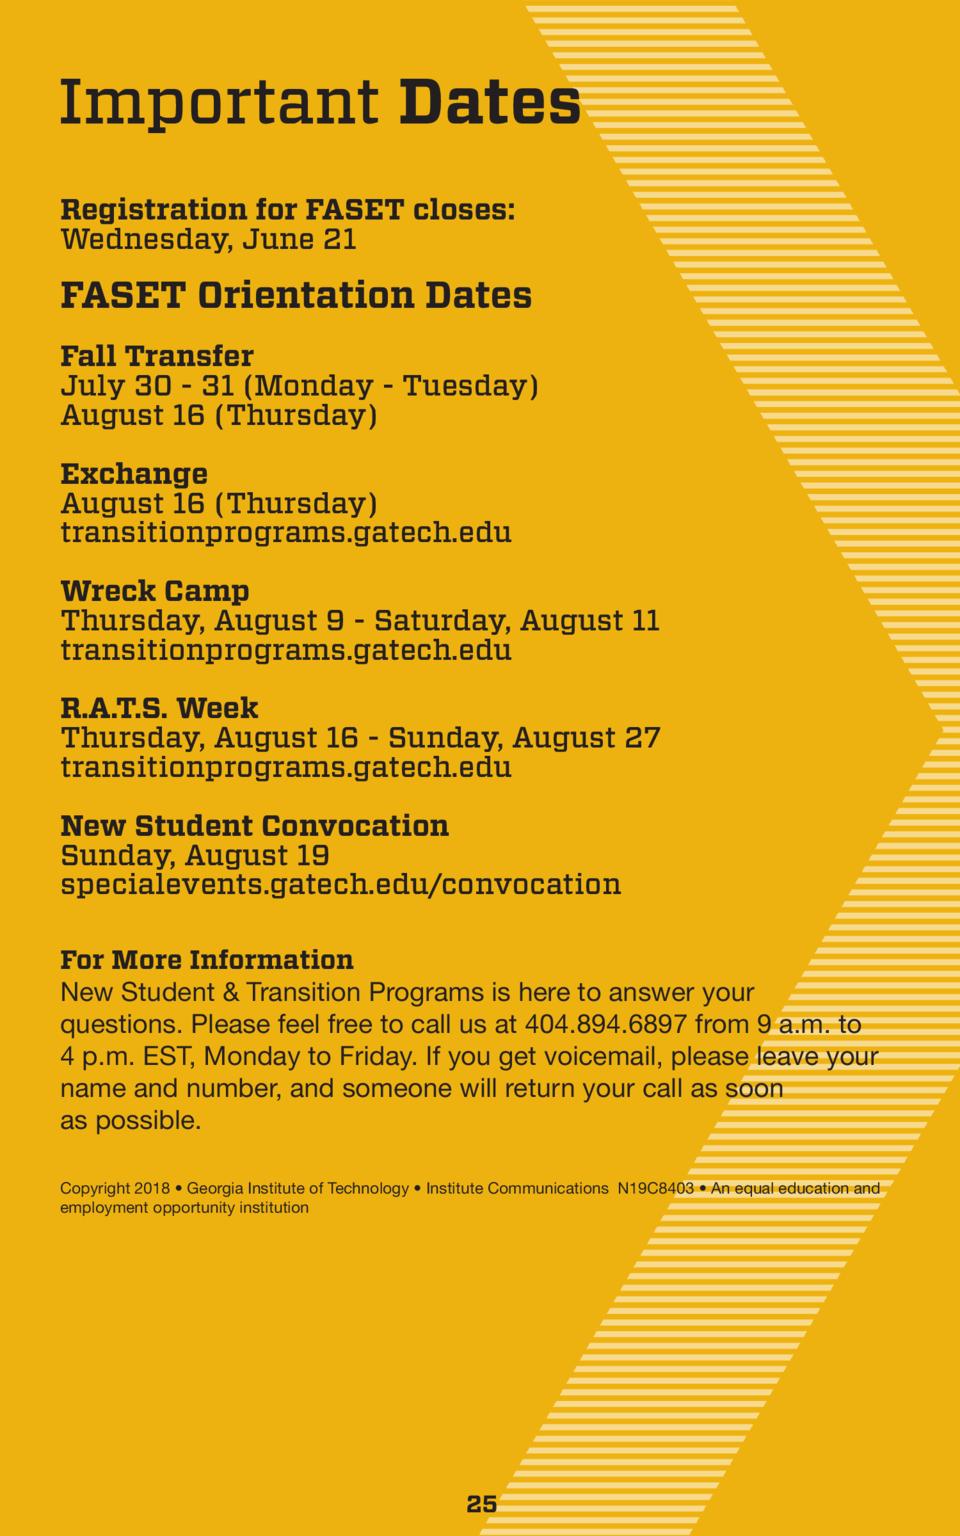 Fall Transfer Orientation | New Student & Transition Programs